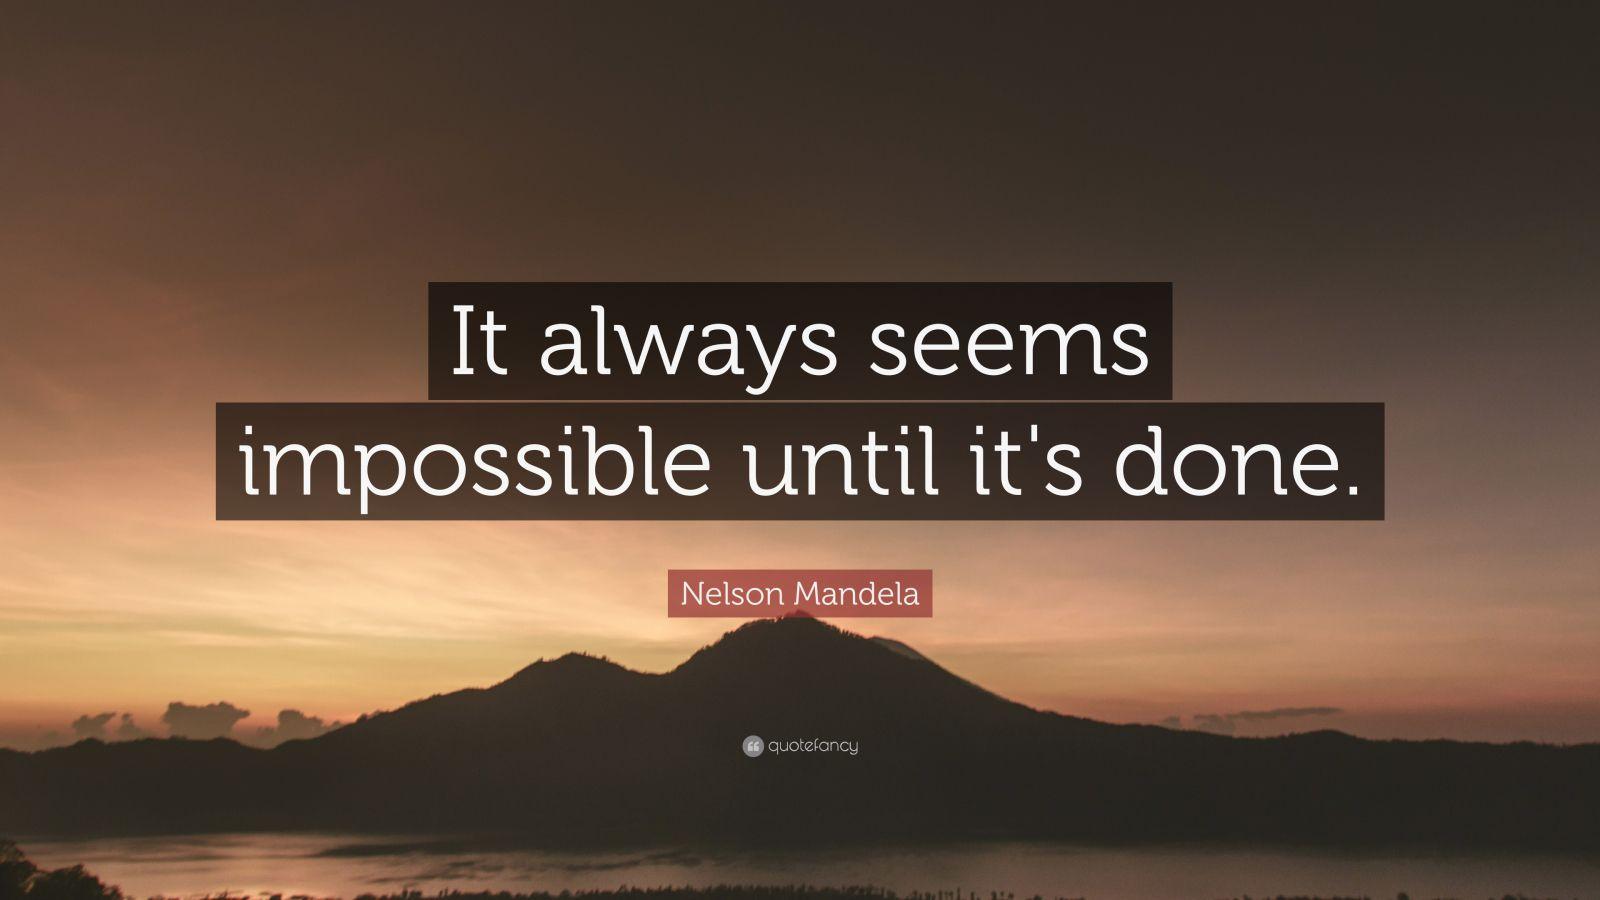 nelson mandela quote   u201cit always seems impossible until it